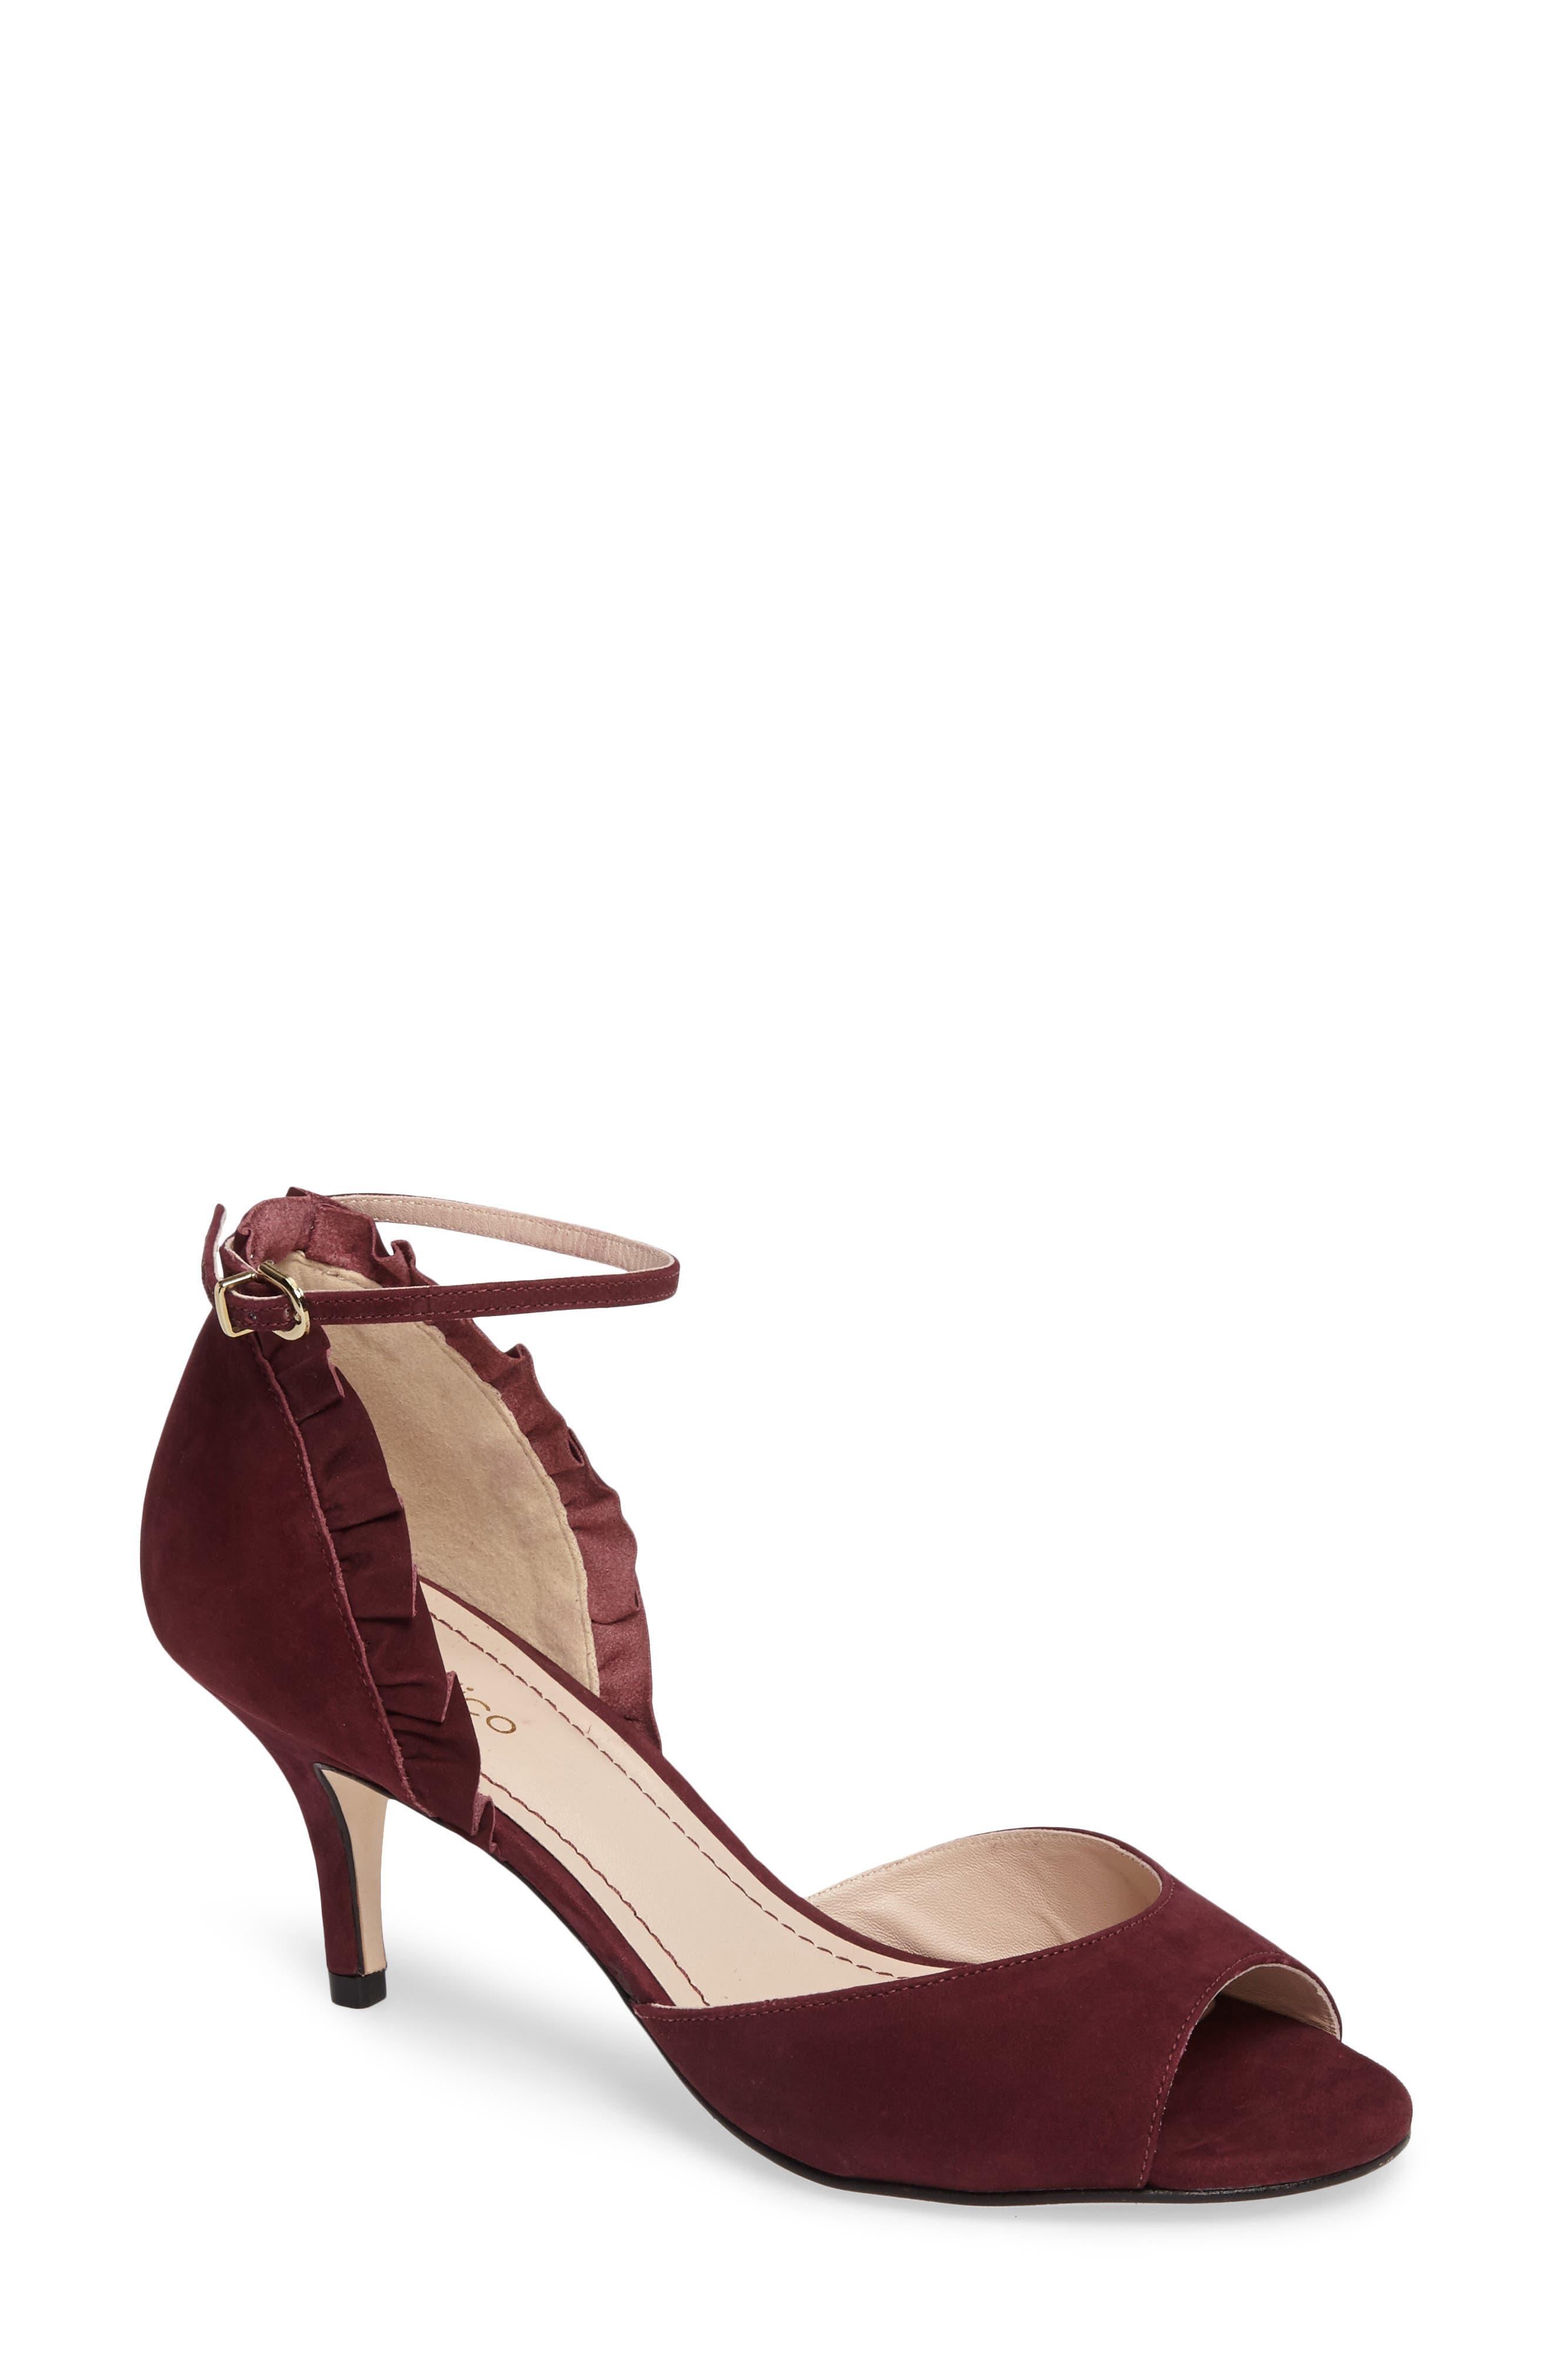 Alisa d'Orsay Sandal,                         Main,                         color, Wine Nubuck Leather